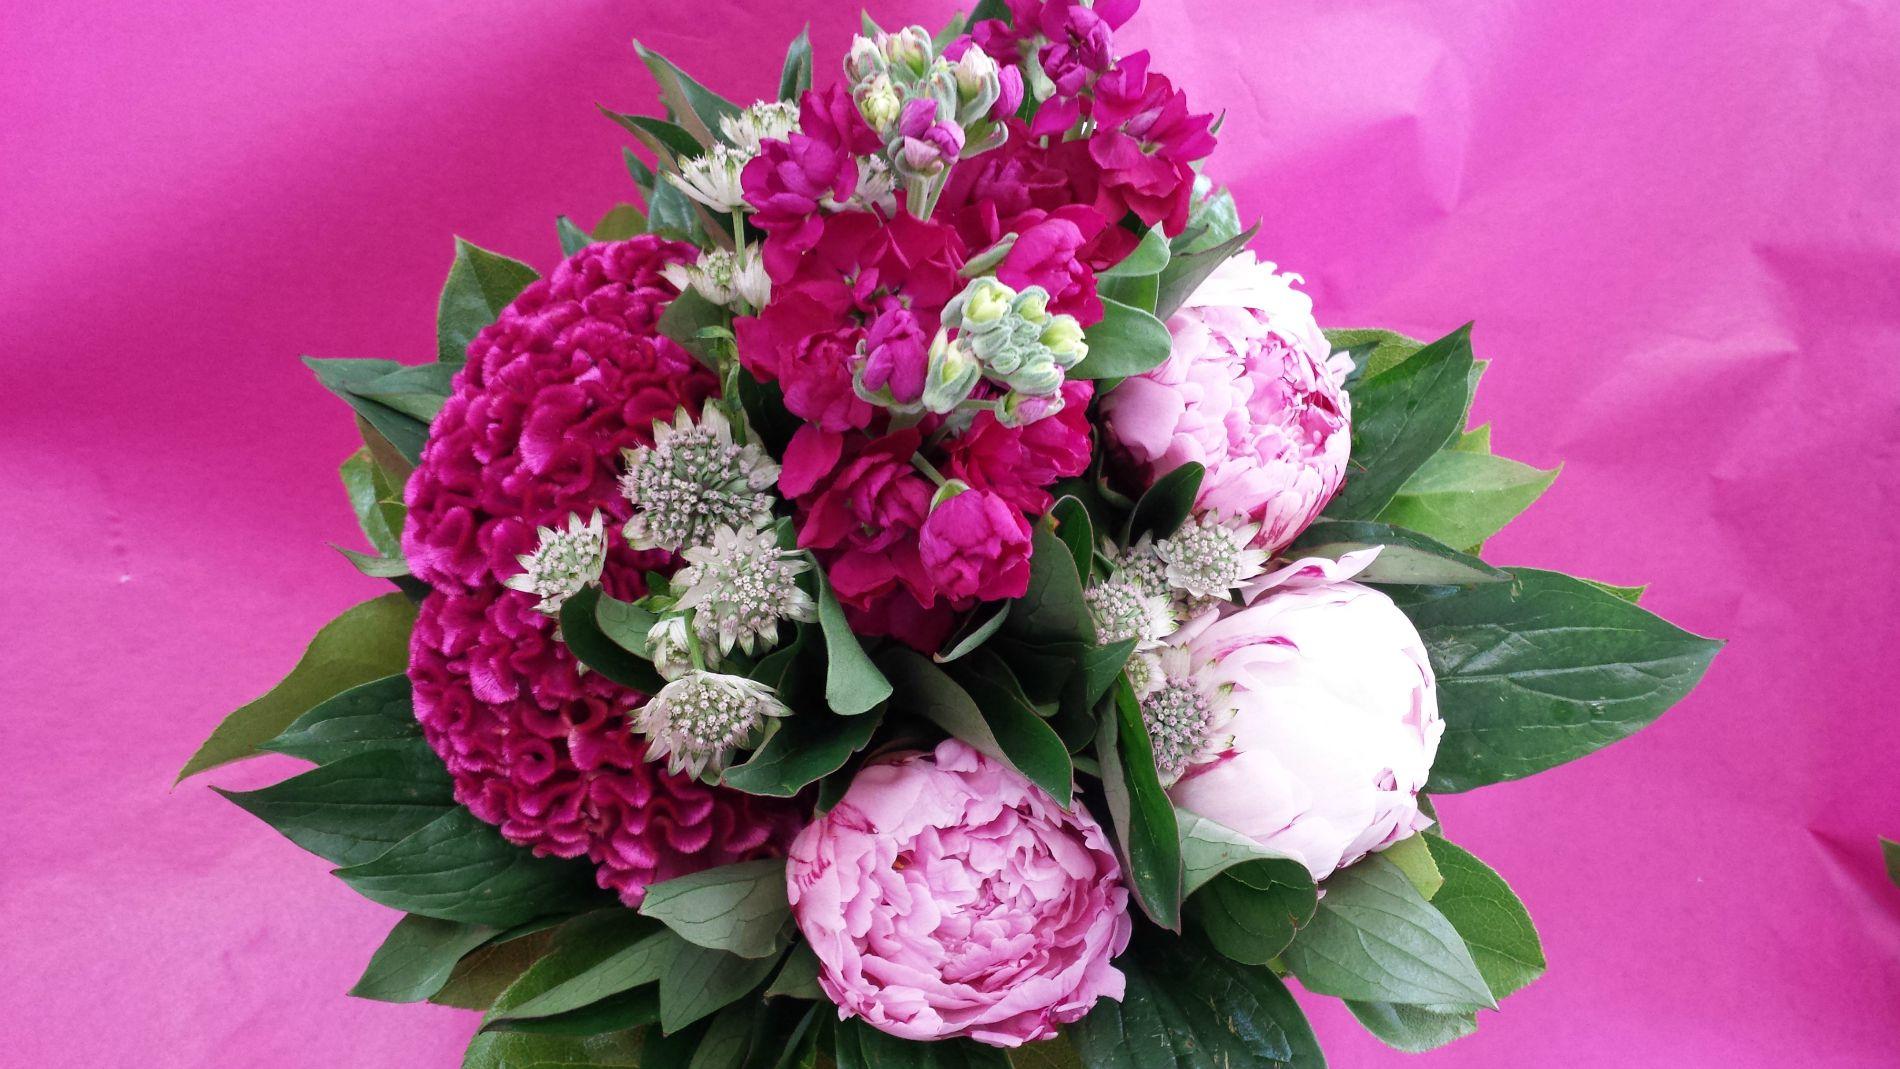 Pfingstrosen-Strauß-Moderne-Floristik-Blumenfee